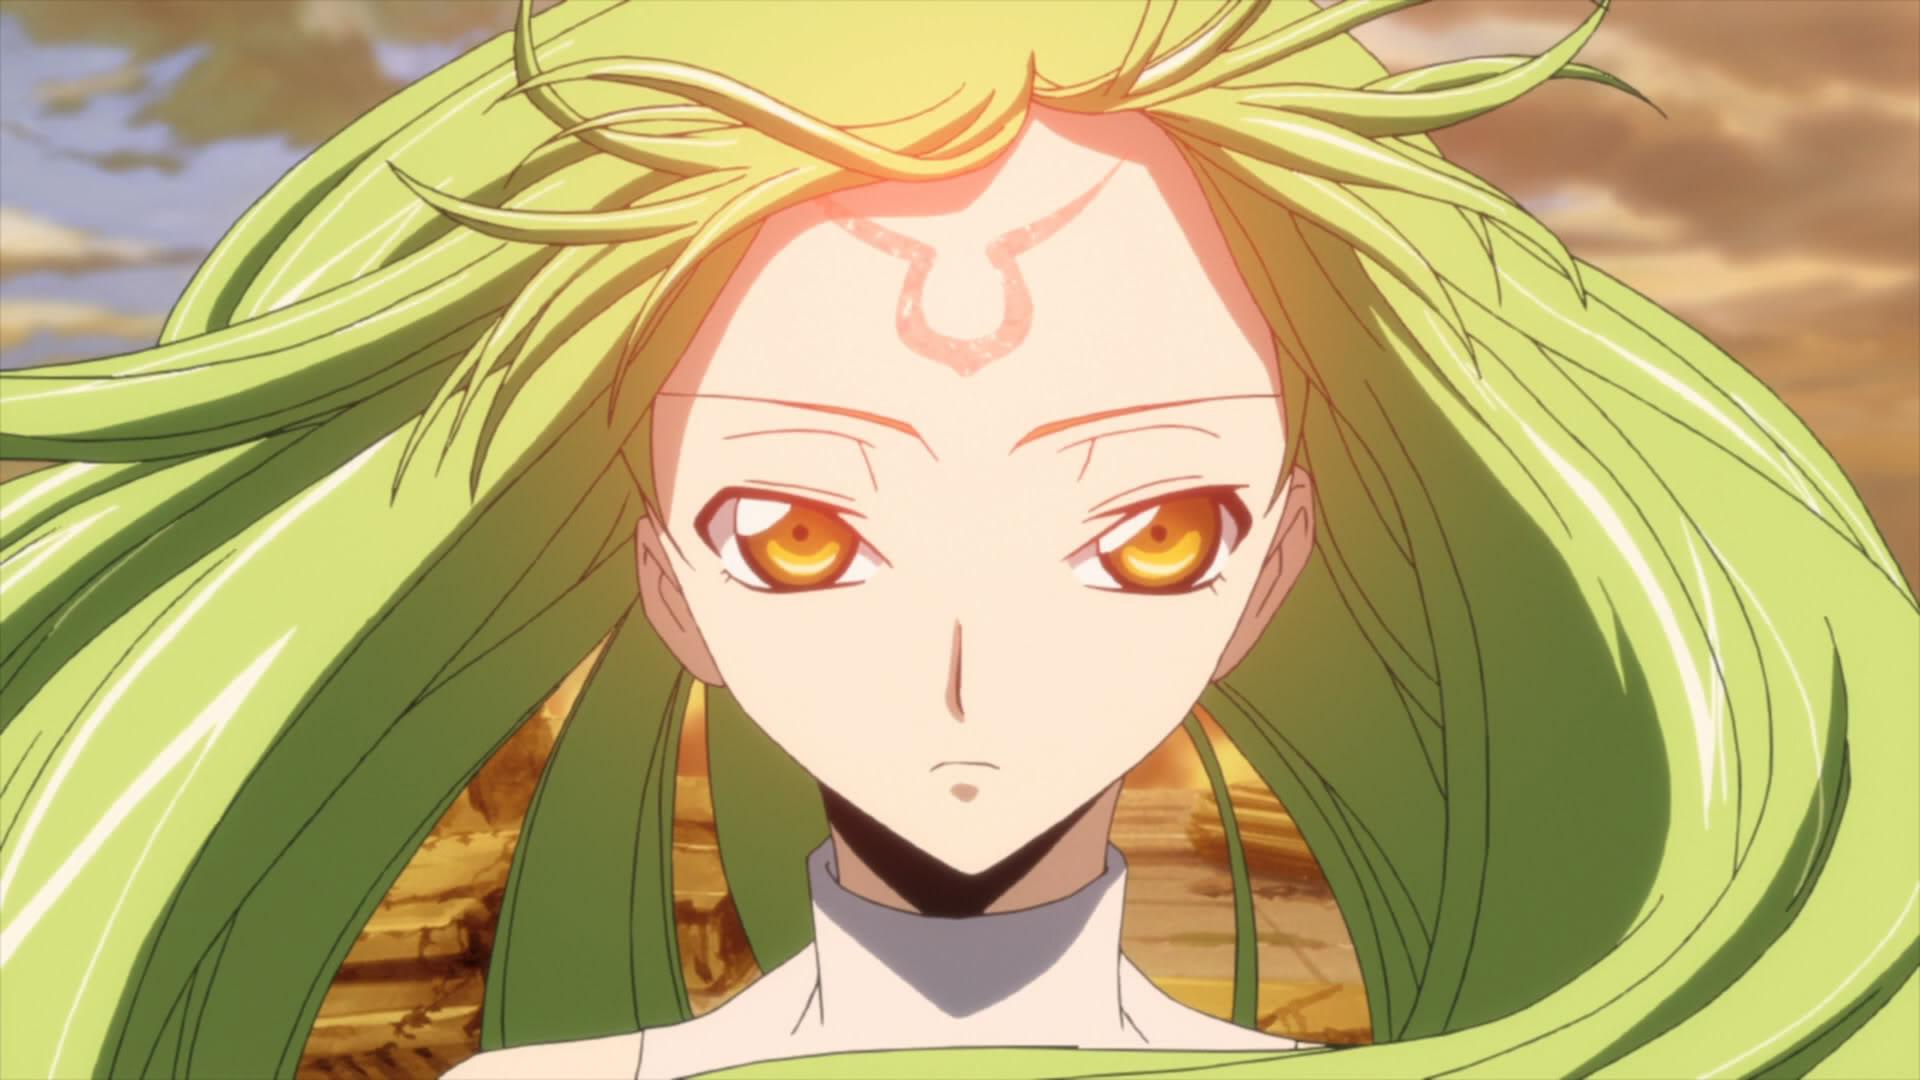 Gintama - Tama